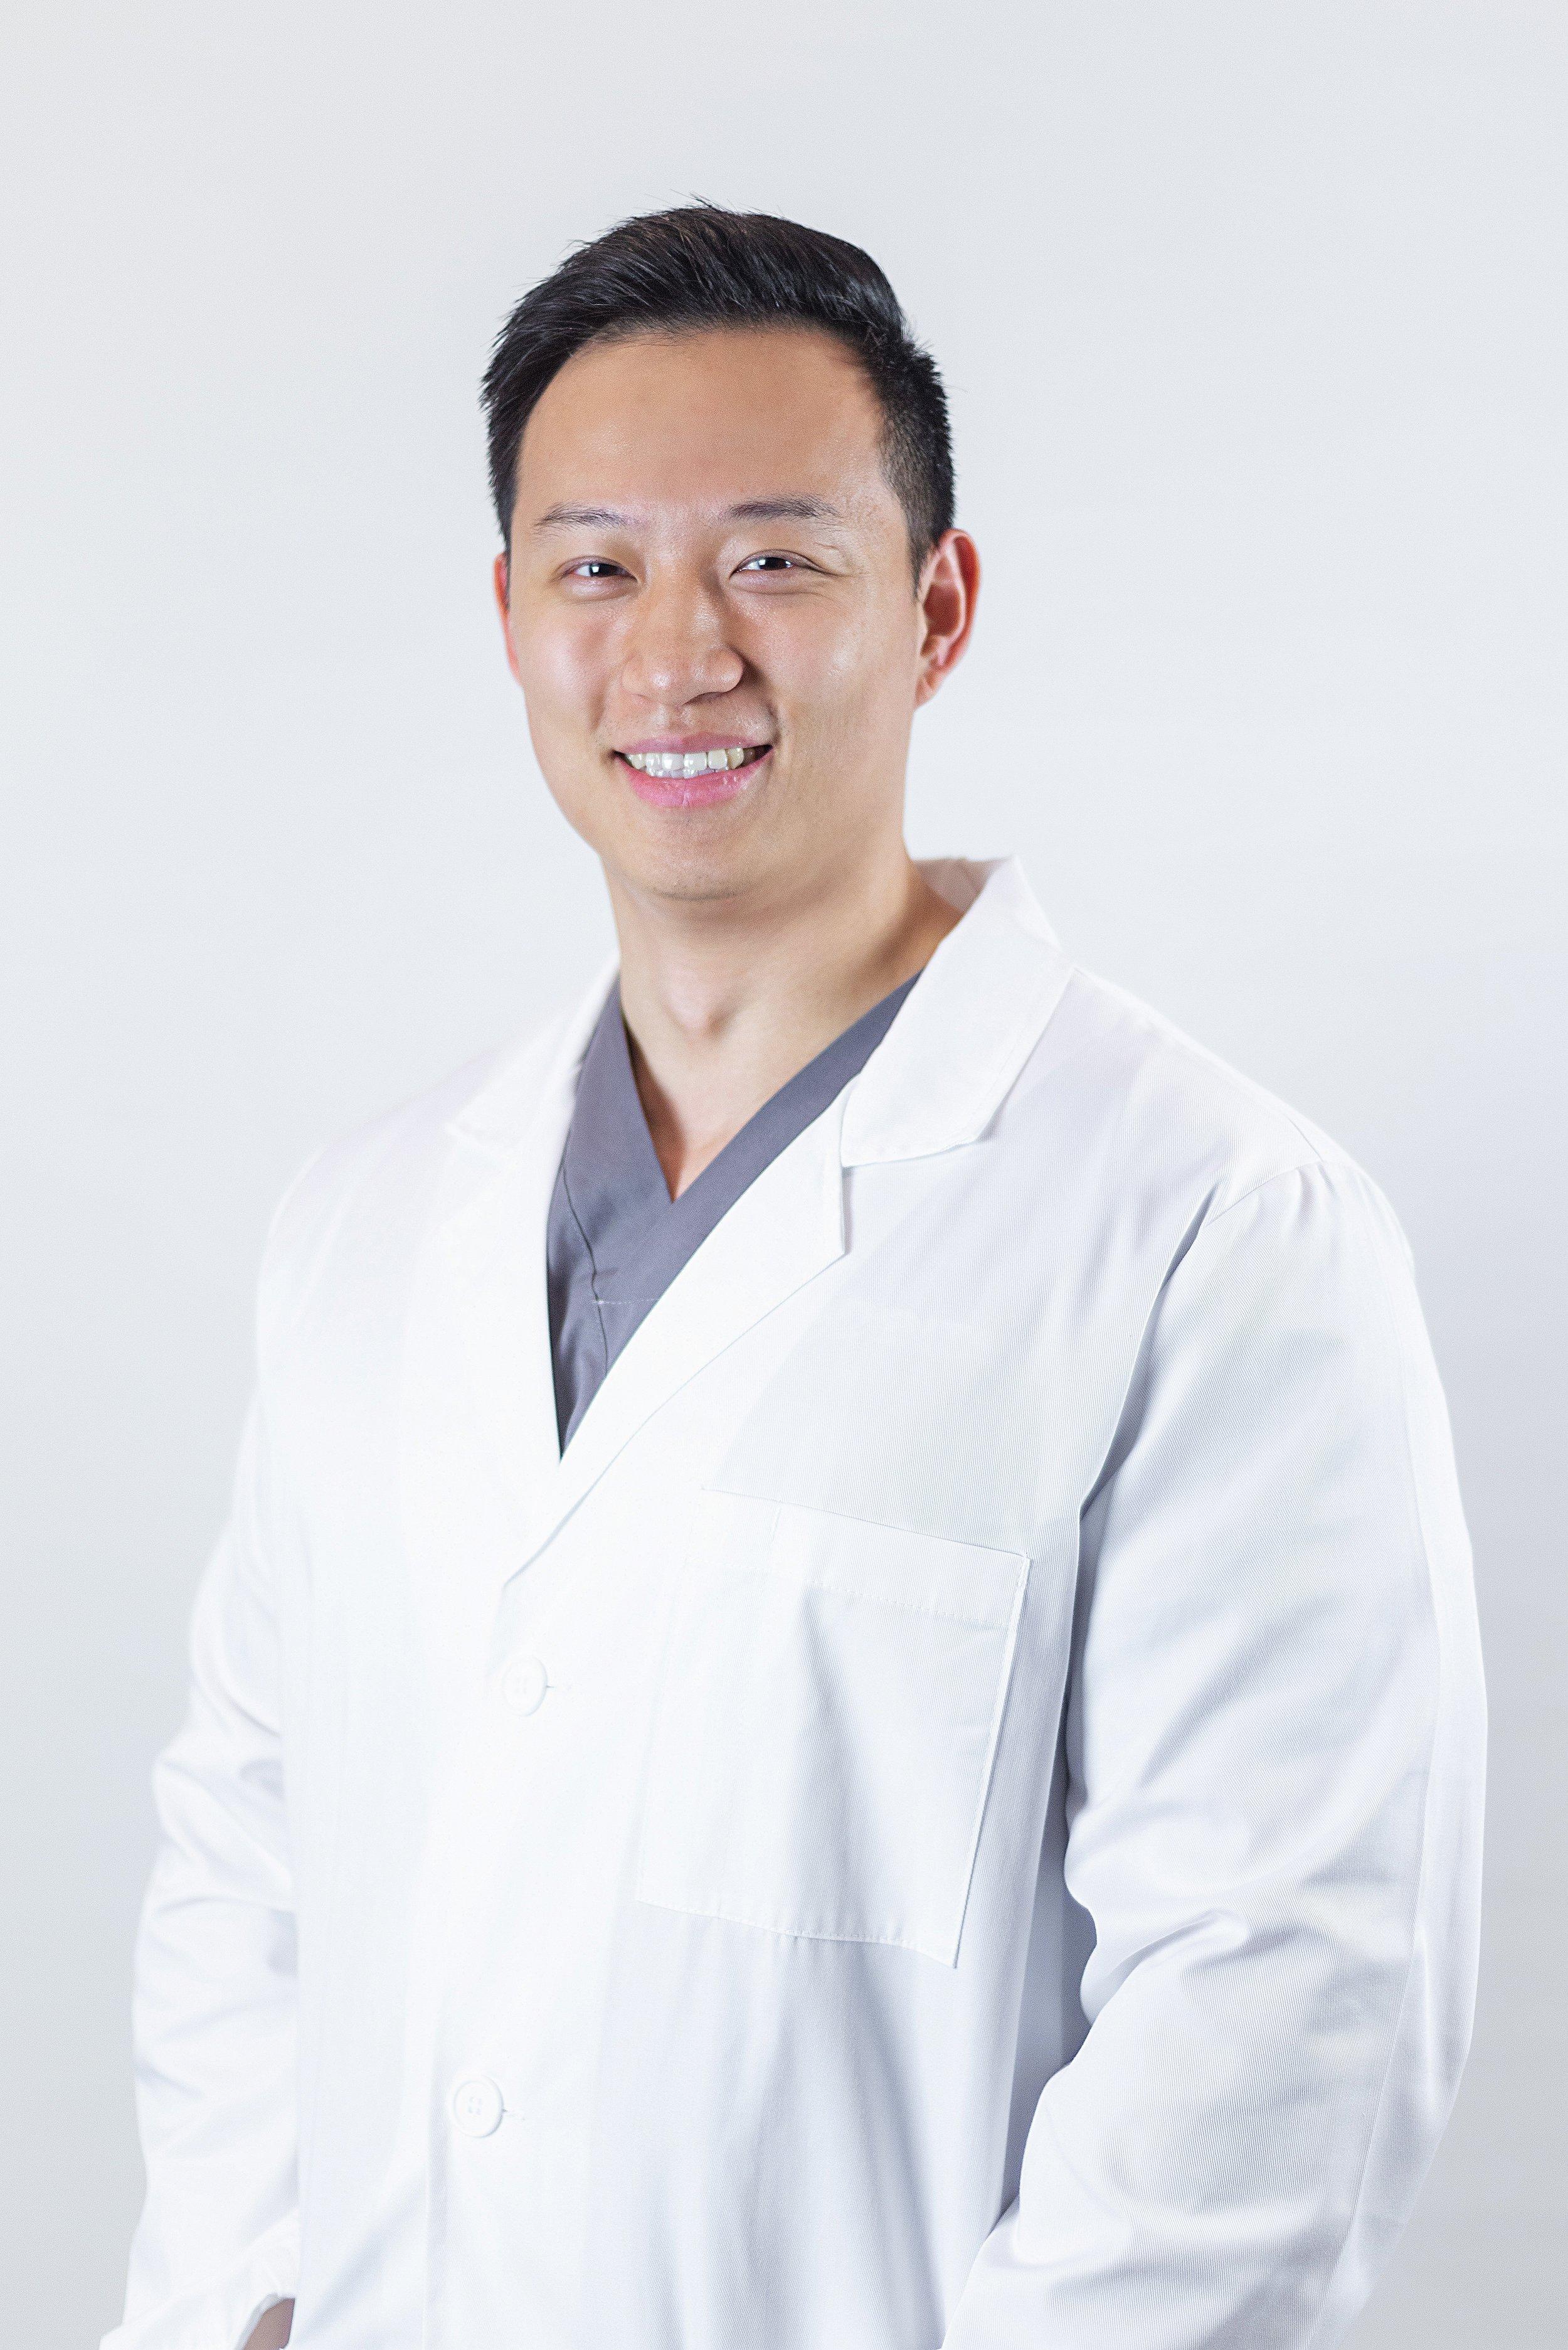 Meet Dr. Nick Yeung at 8 to 8 Dental Care.